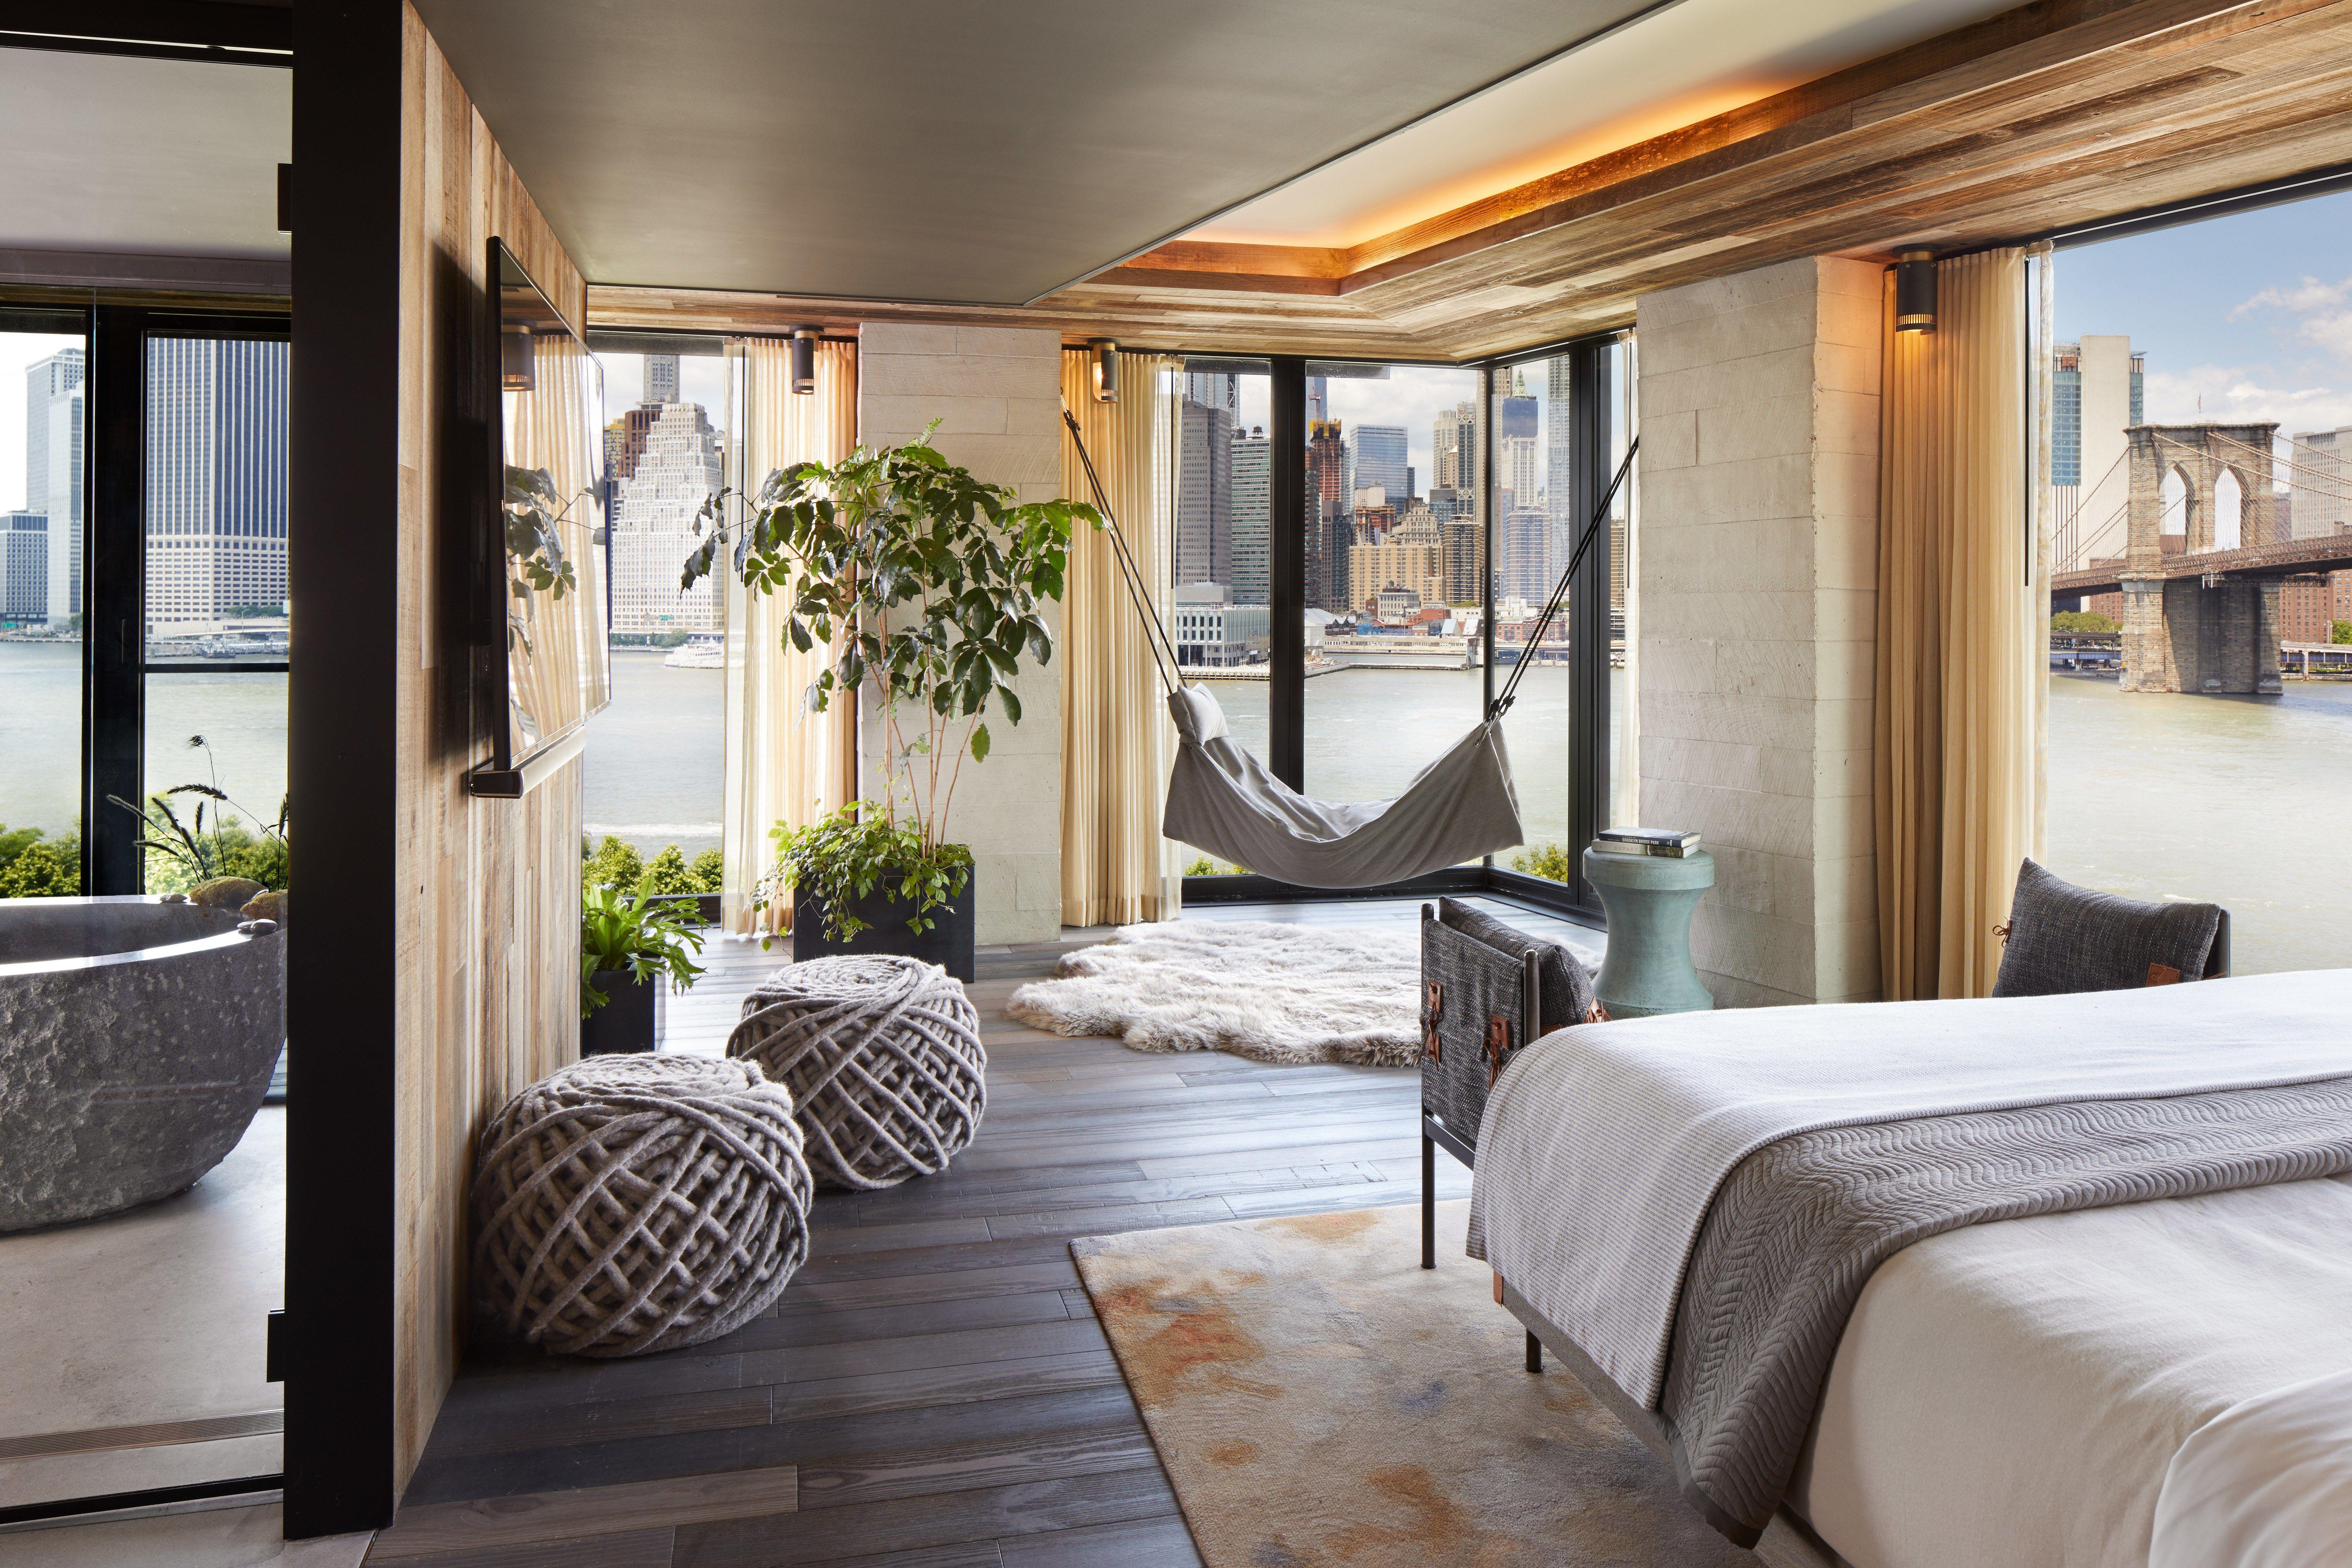 1189 best Hotels & resorts images on Pinterest